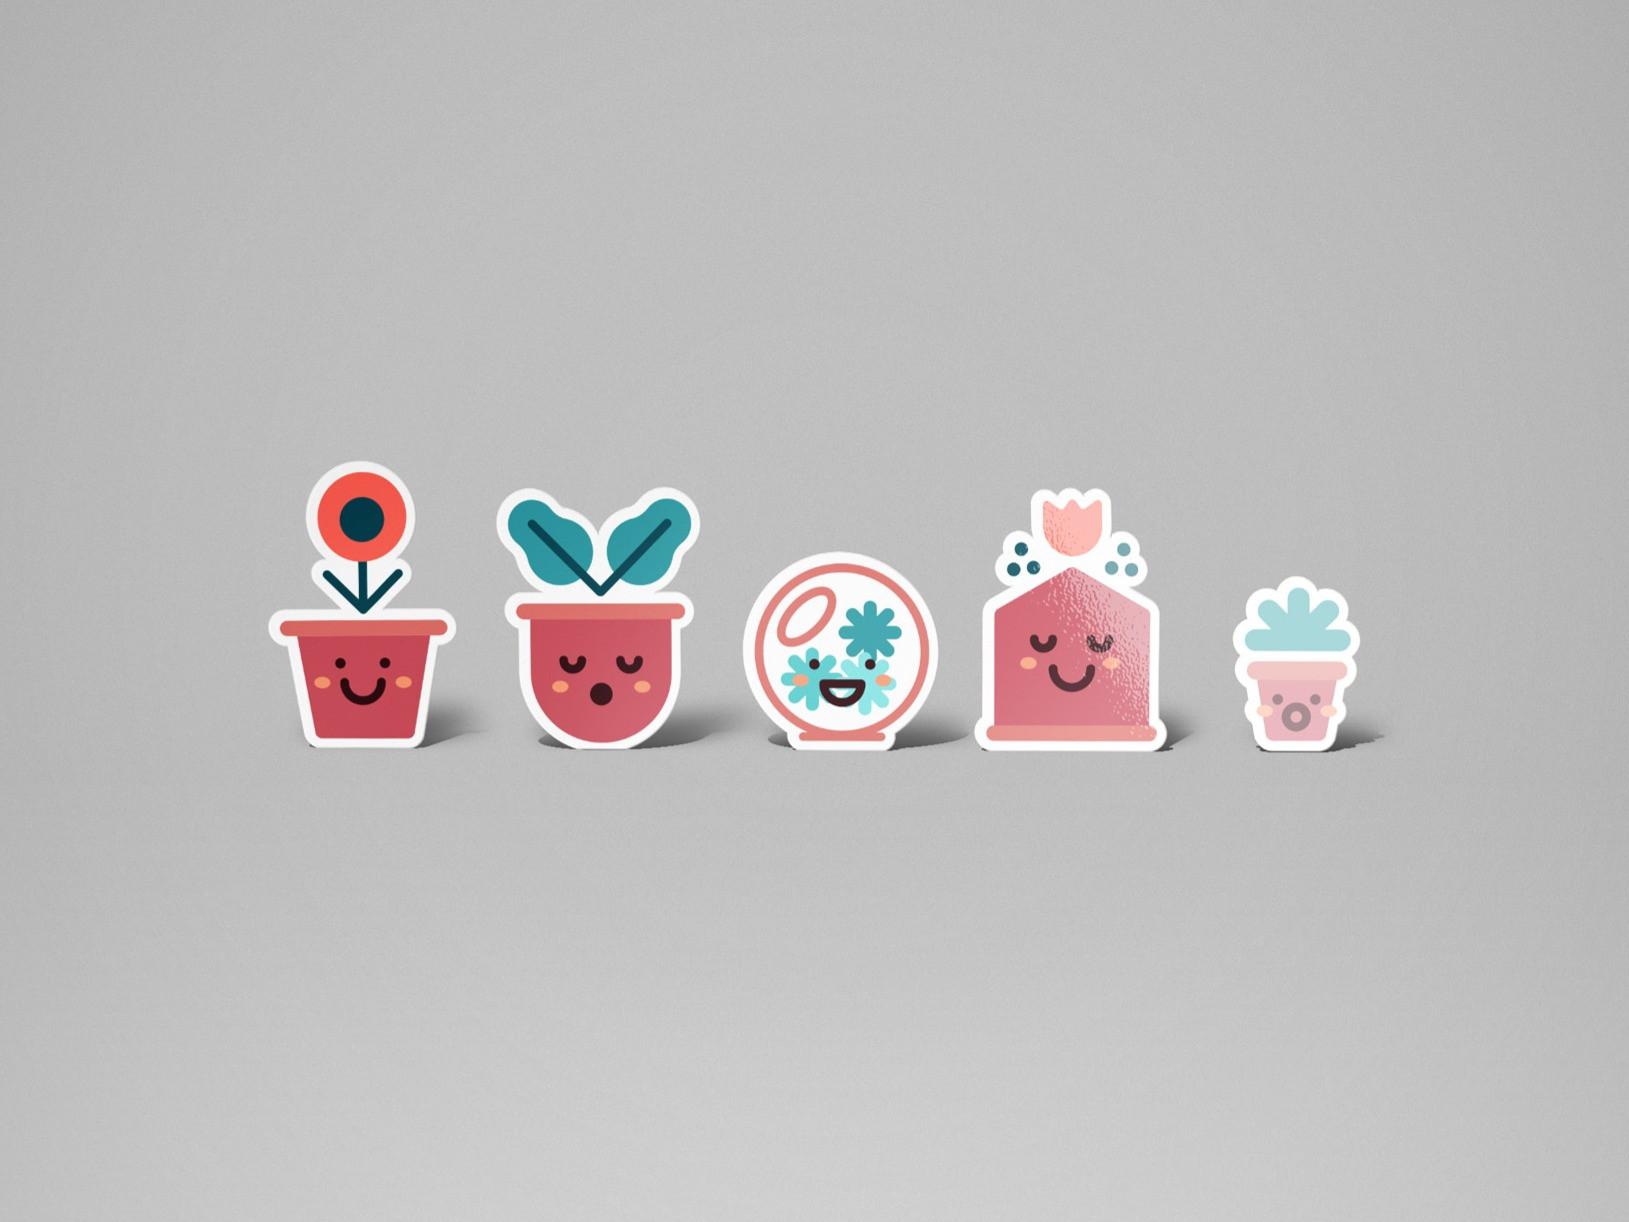 diecut-stickers-multiple_edited.jpg